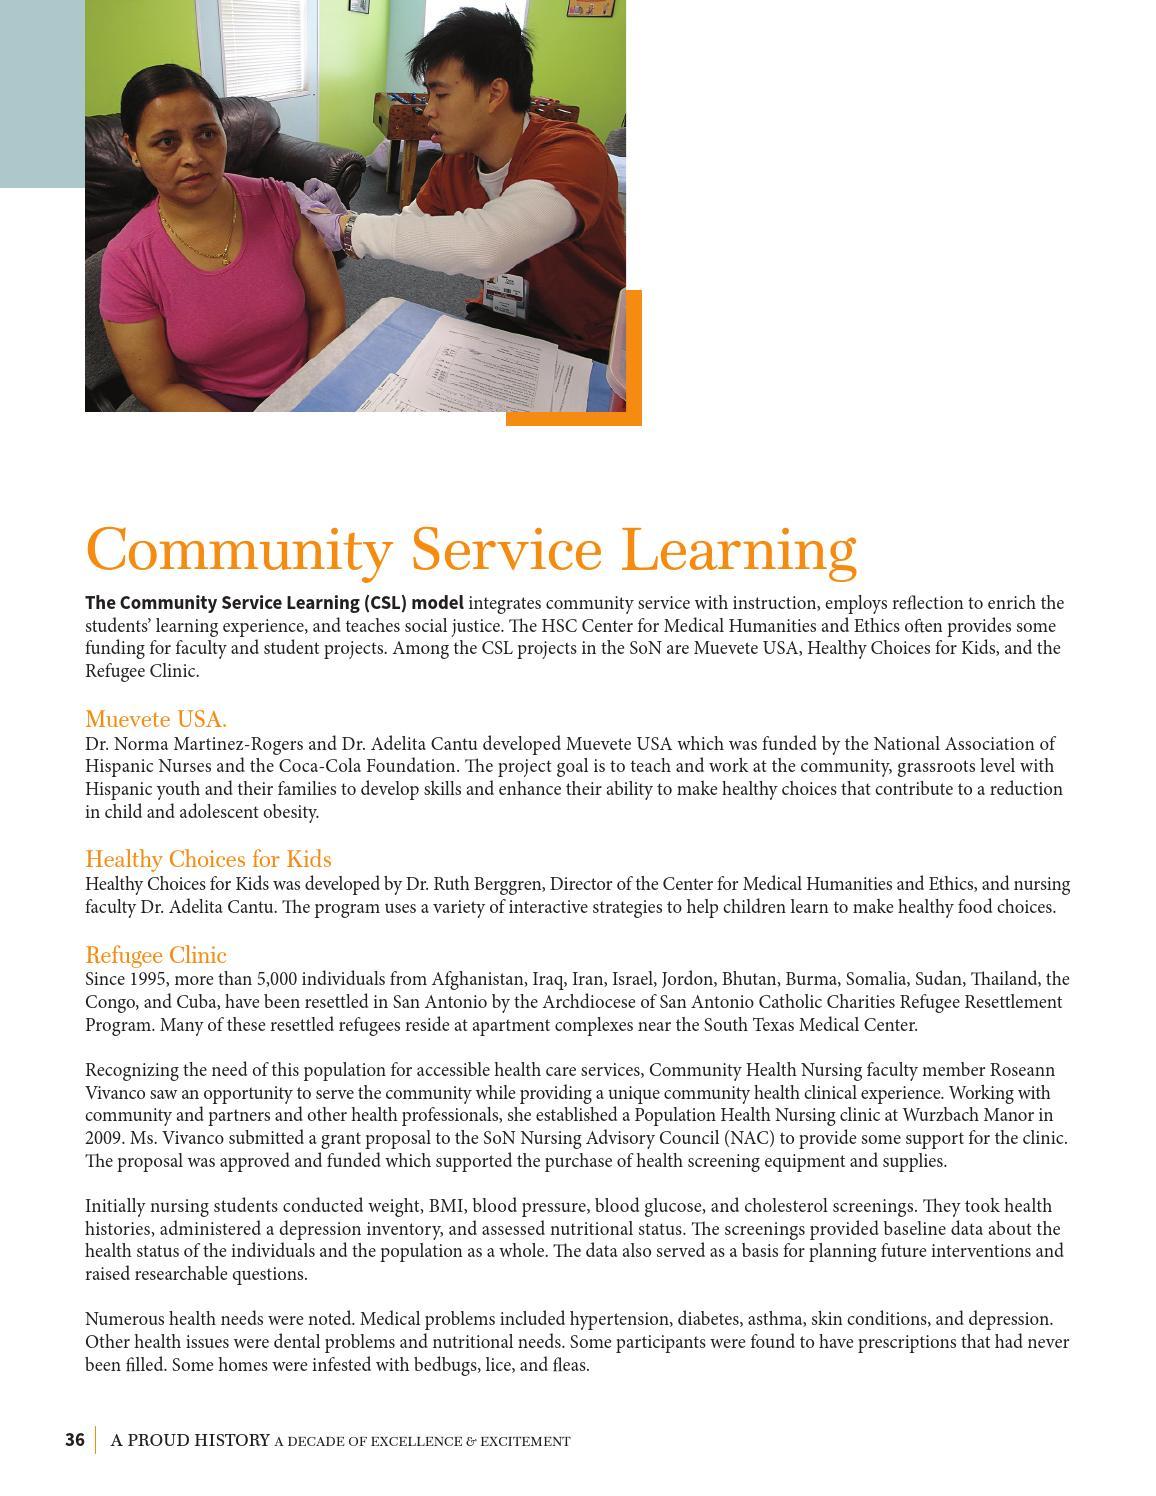 School of Nursing History Book by UT Health San Antonio - issuu